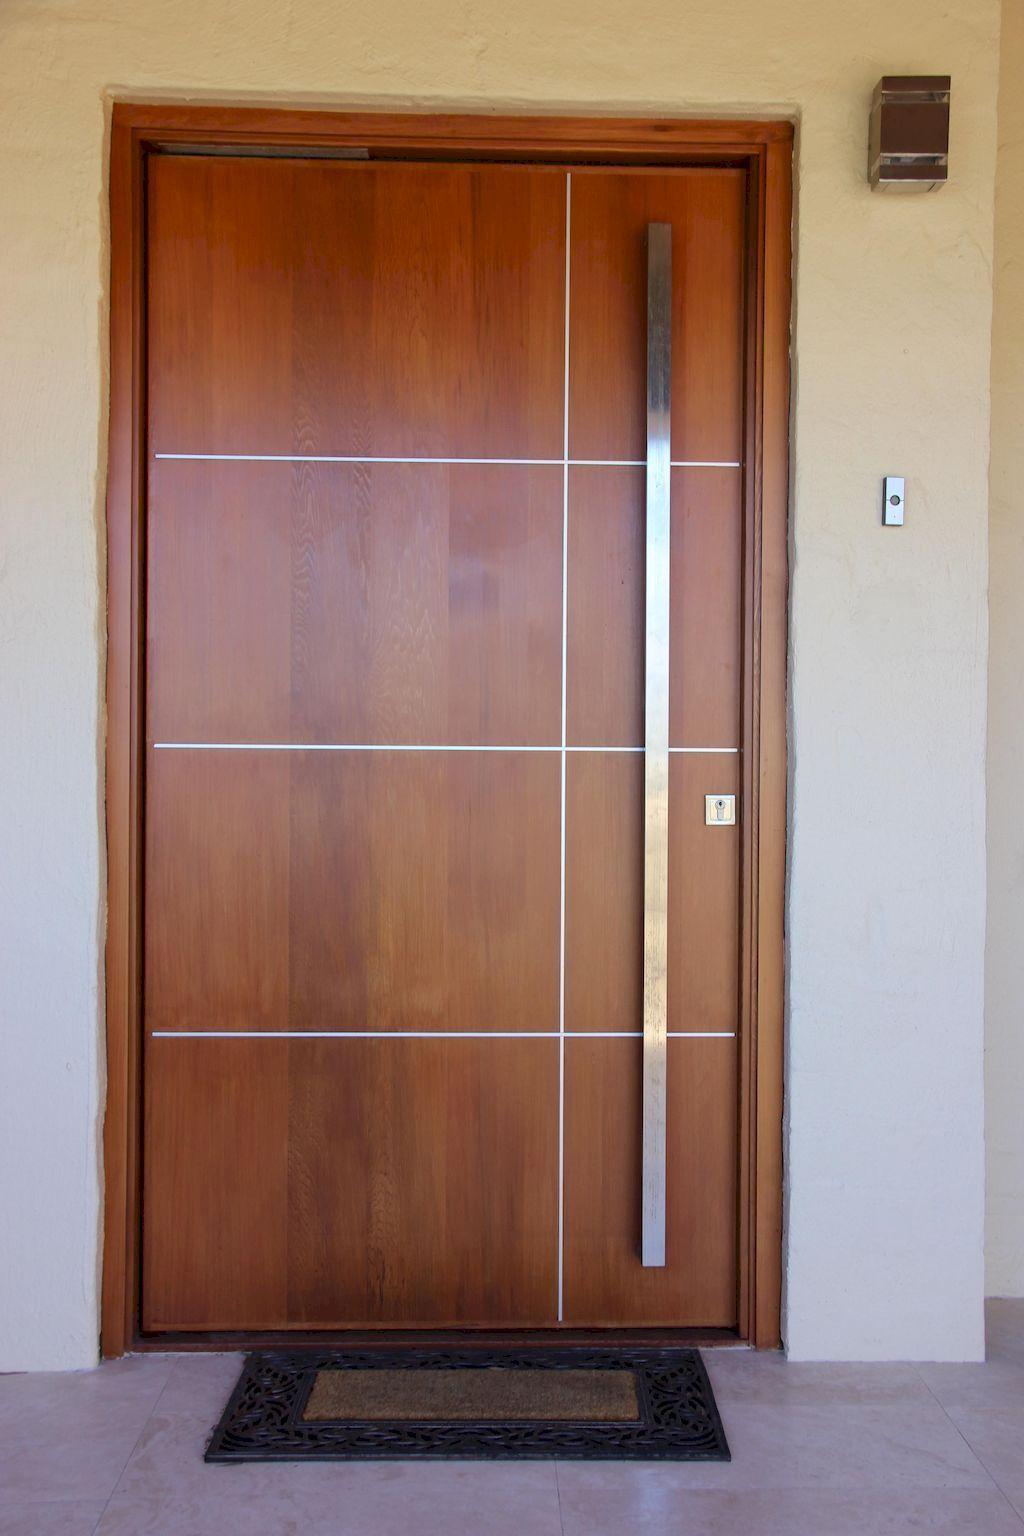 Attractive 10 Ideas For A Special Entrance To Your Home Https Homemidi Com 2019 04 04 10 Ideas Main Door Design Doors Interior Modern Wood Doors Interior